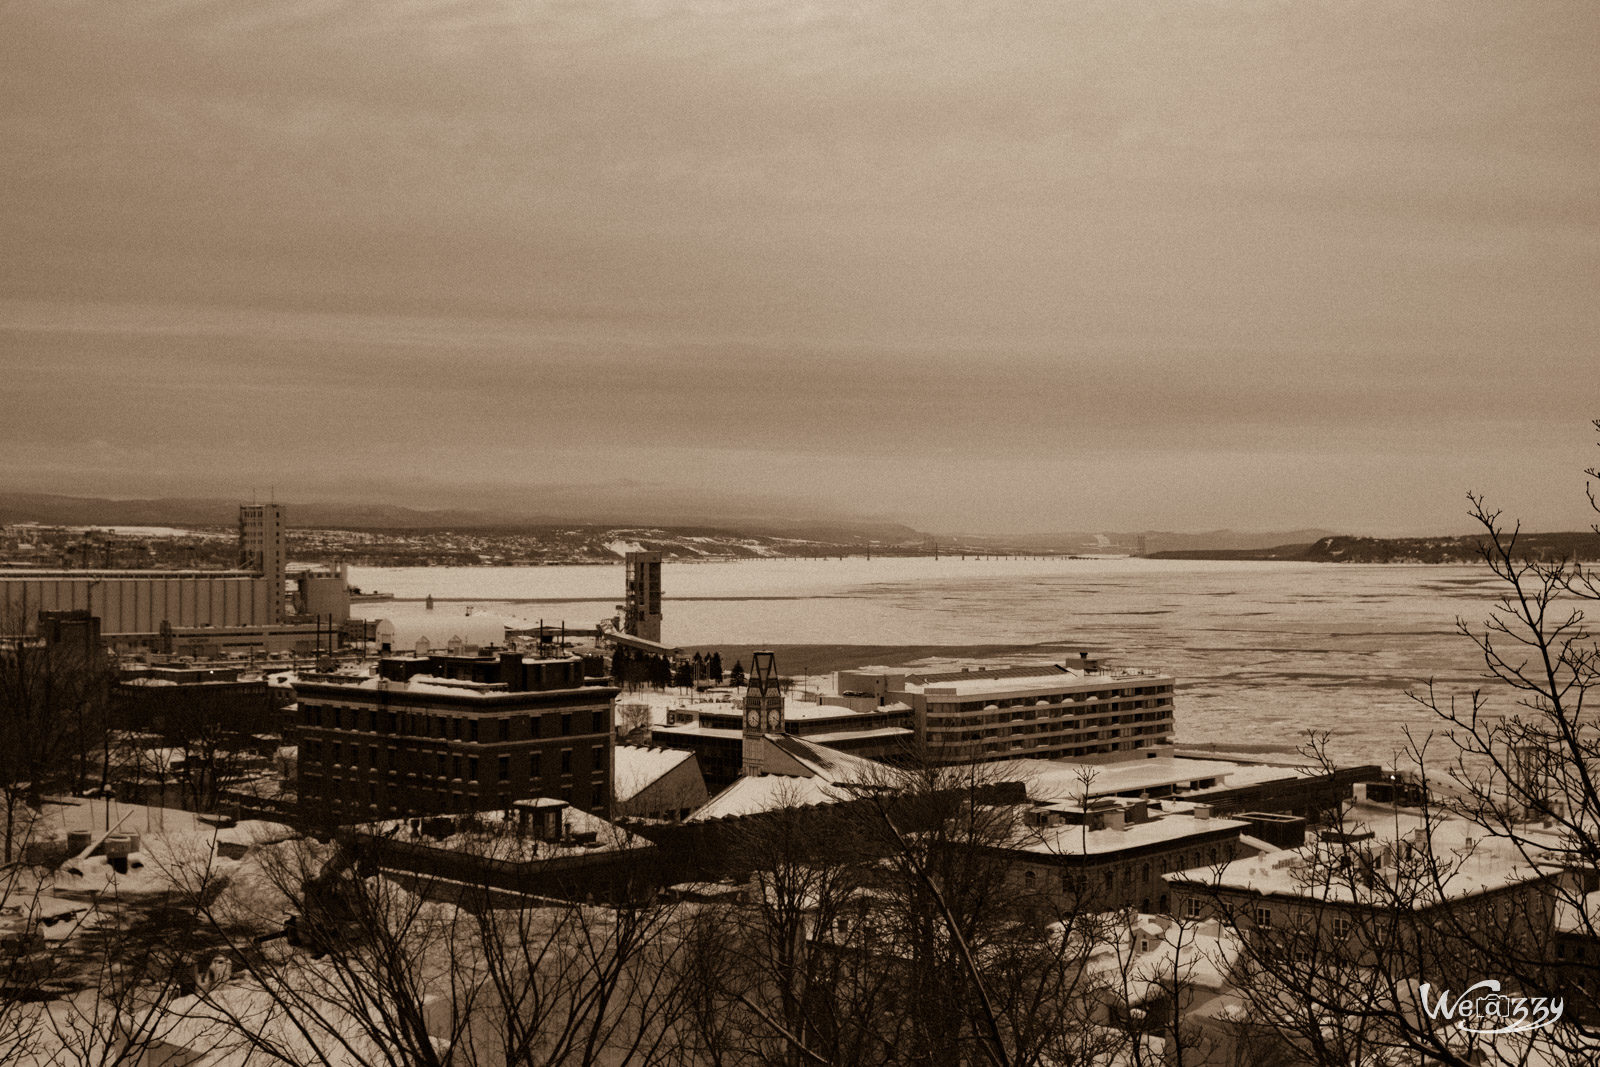 Canada, Hiver, Québec, Saint-Laurent, Voyage